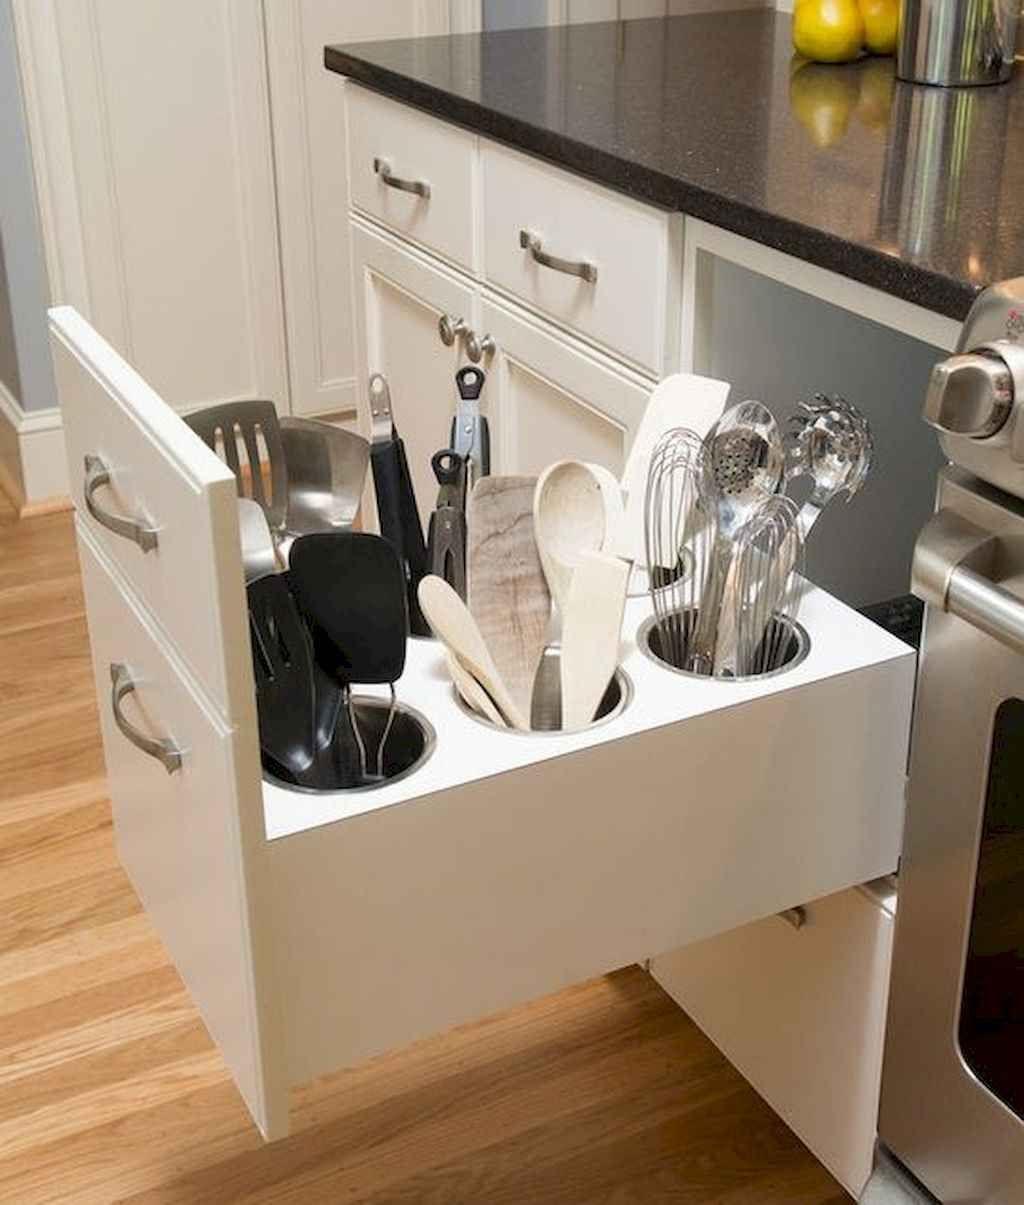 01 brilliant kitchen cabinet organization and tips ideas on brilliant kitchen cabinet organization id=71513